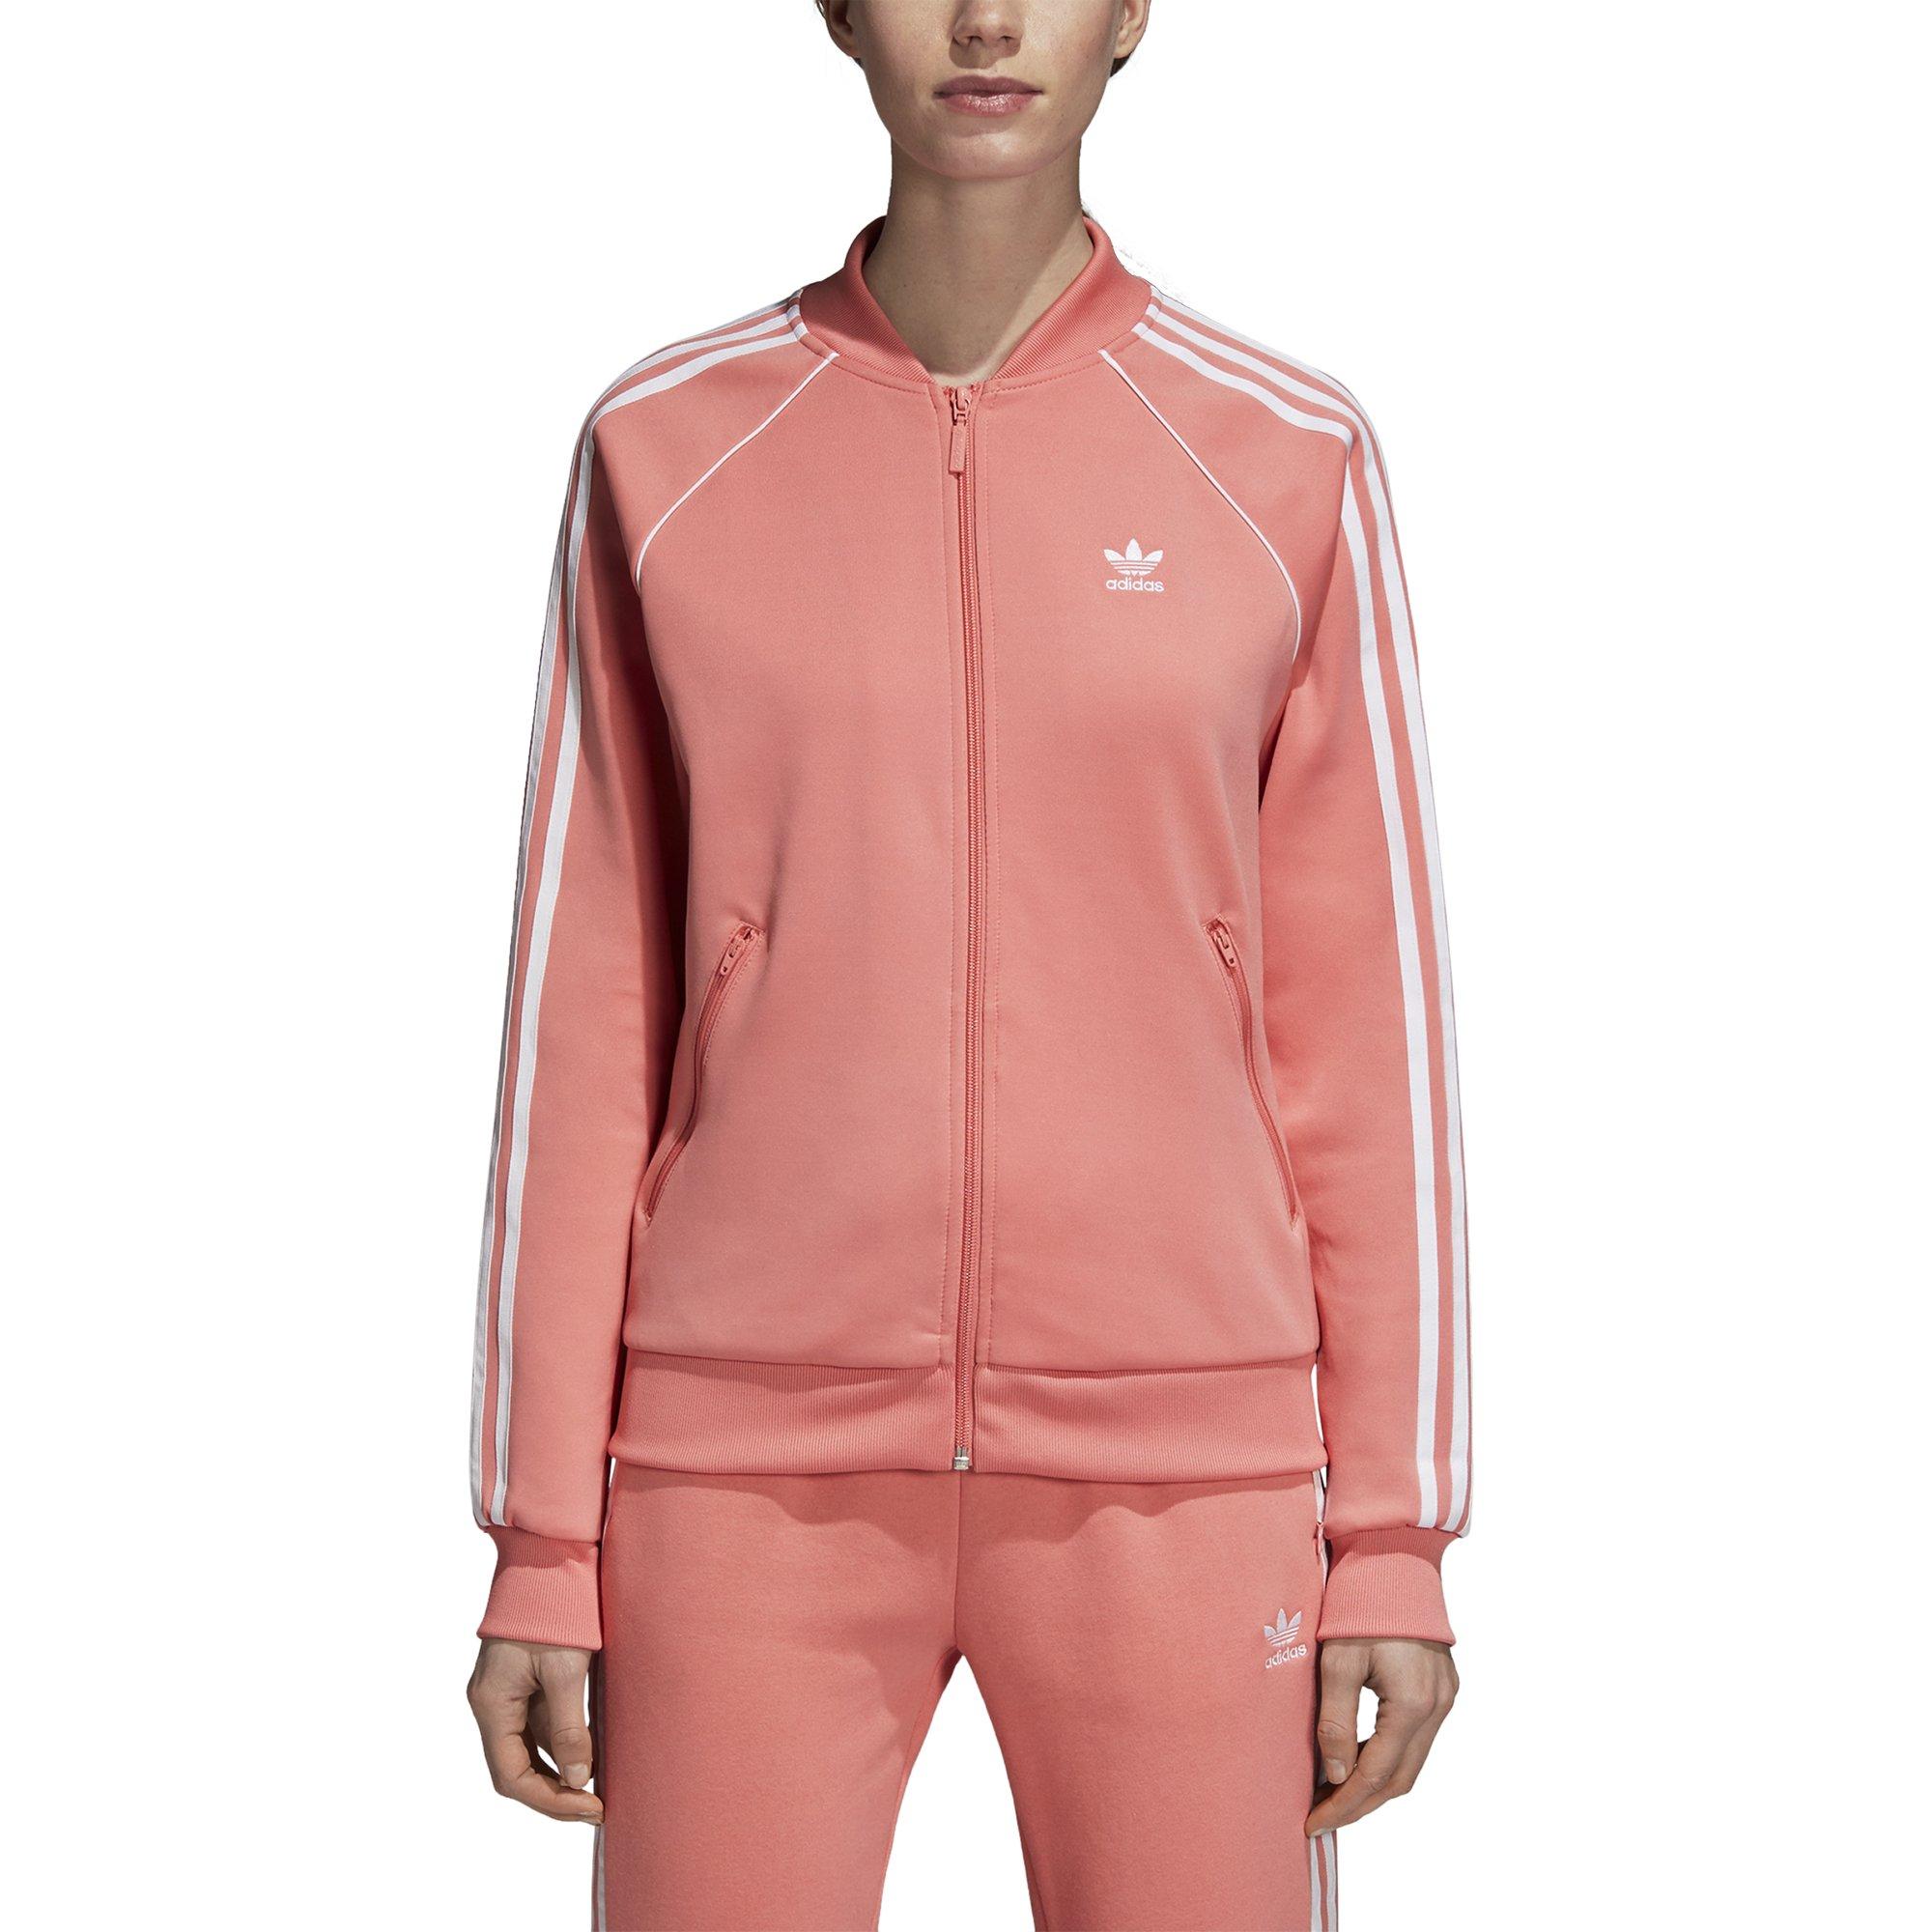 adidas Originals Women's Superstar Tracktop, Tactile Rose, L by adidas Originals (Image #5)